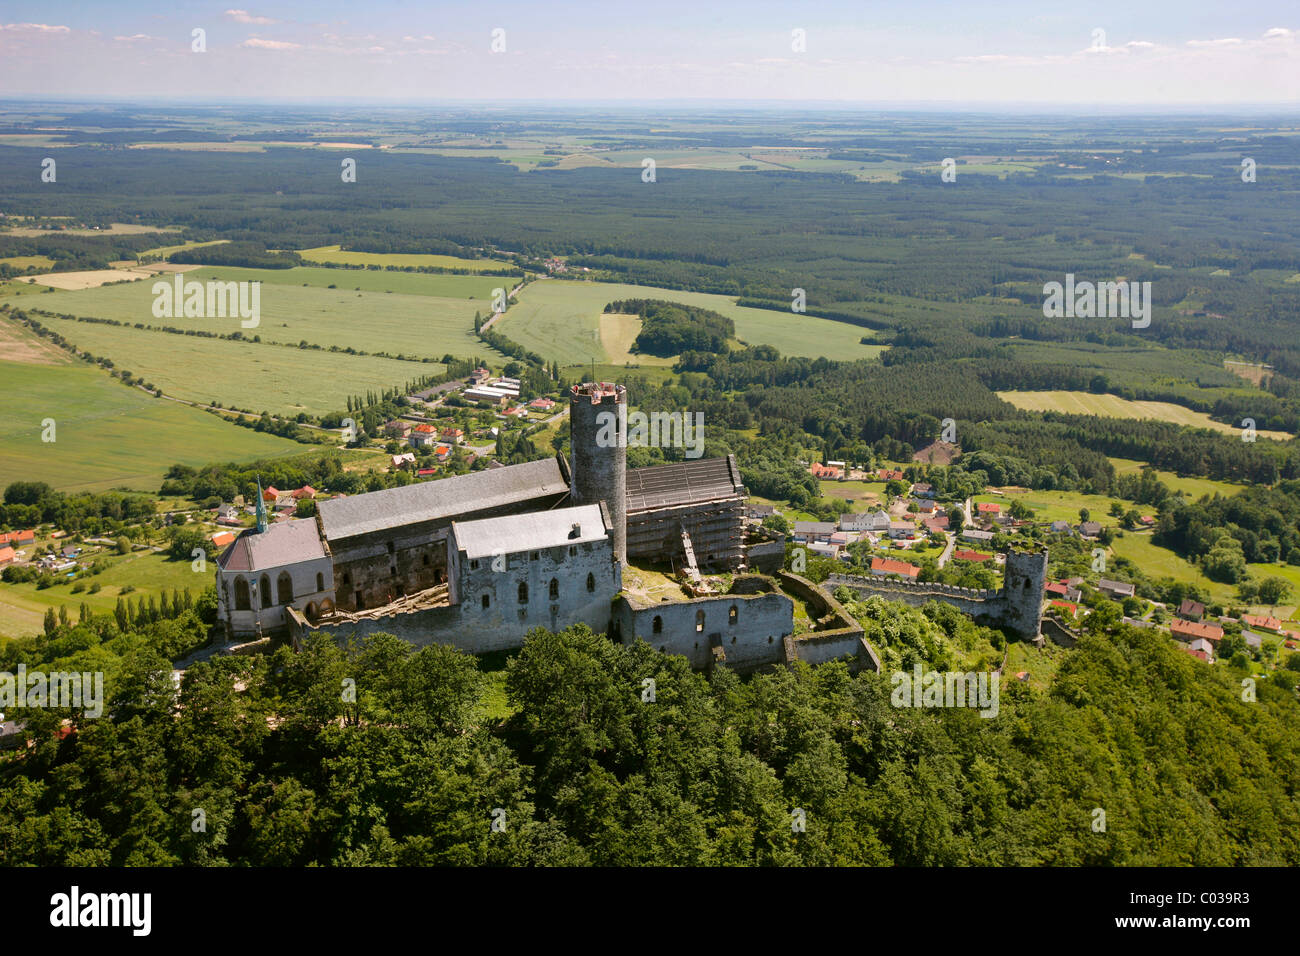 Aerial view, castle and castle hill, Ceska Lipa, Mladá Boleslav, Central Bohemia, Czech Republic, Europe Stock Photo